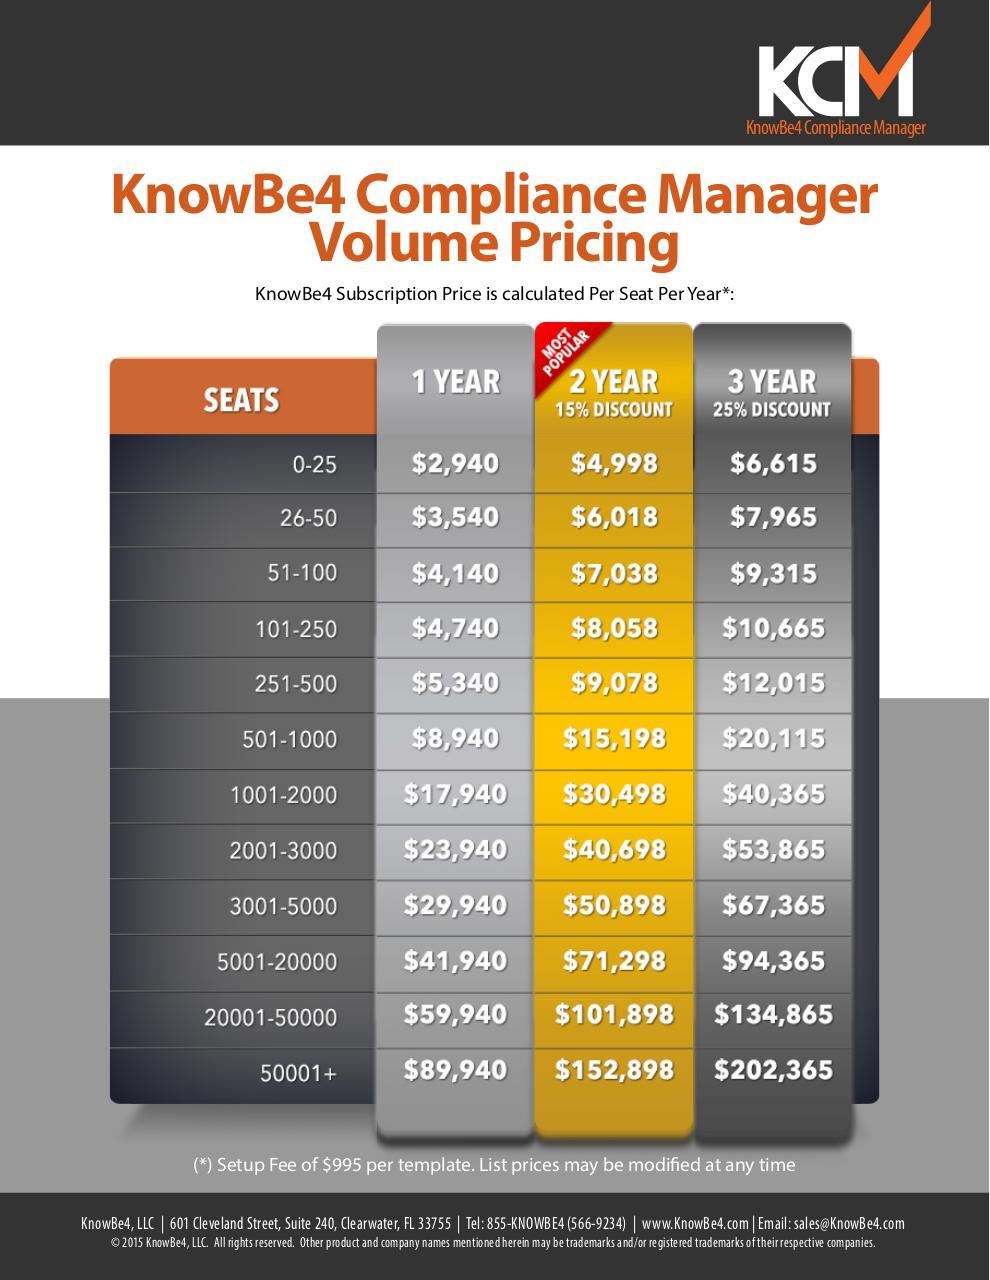 pricinglevels - KnowBe4 Price Level for KCM pdf - PDF Archive